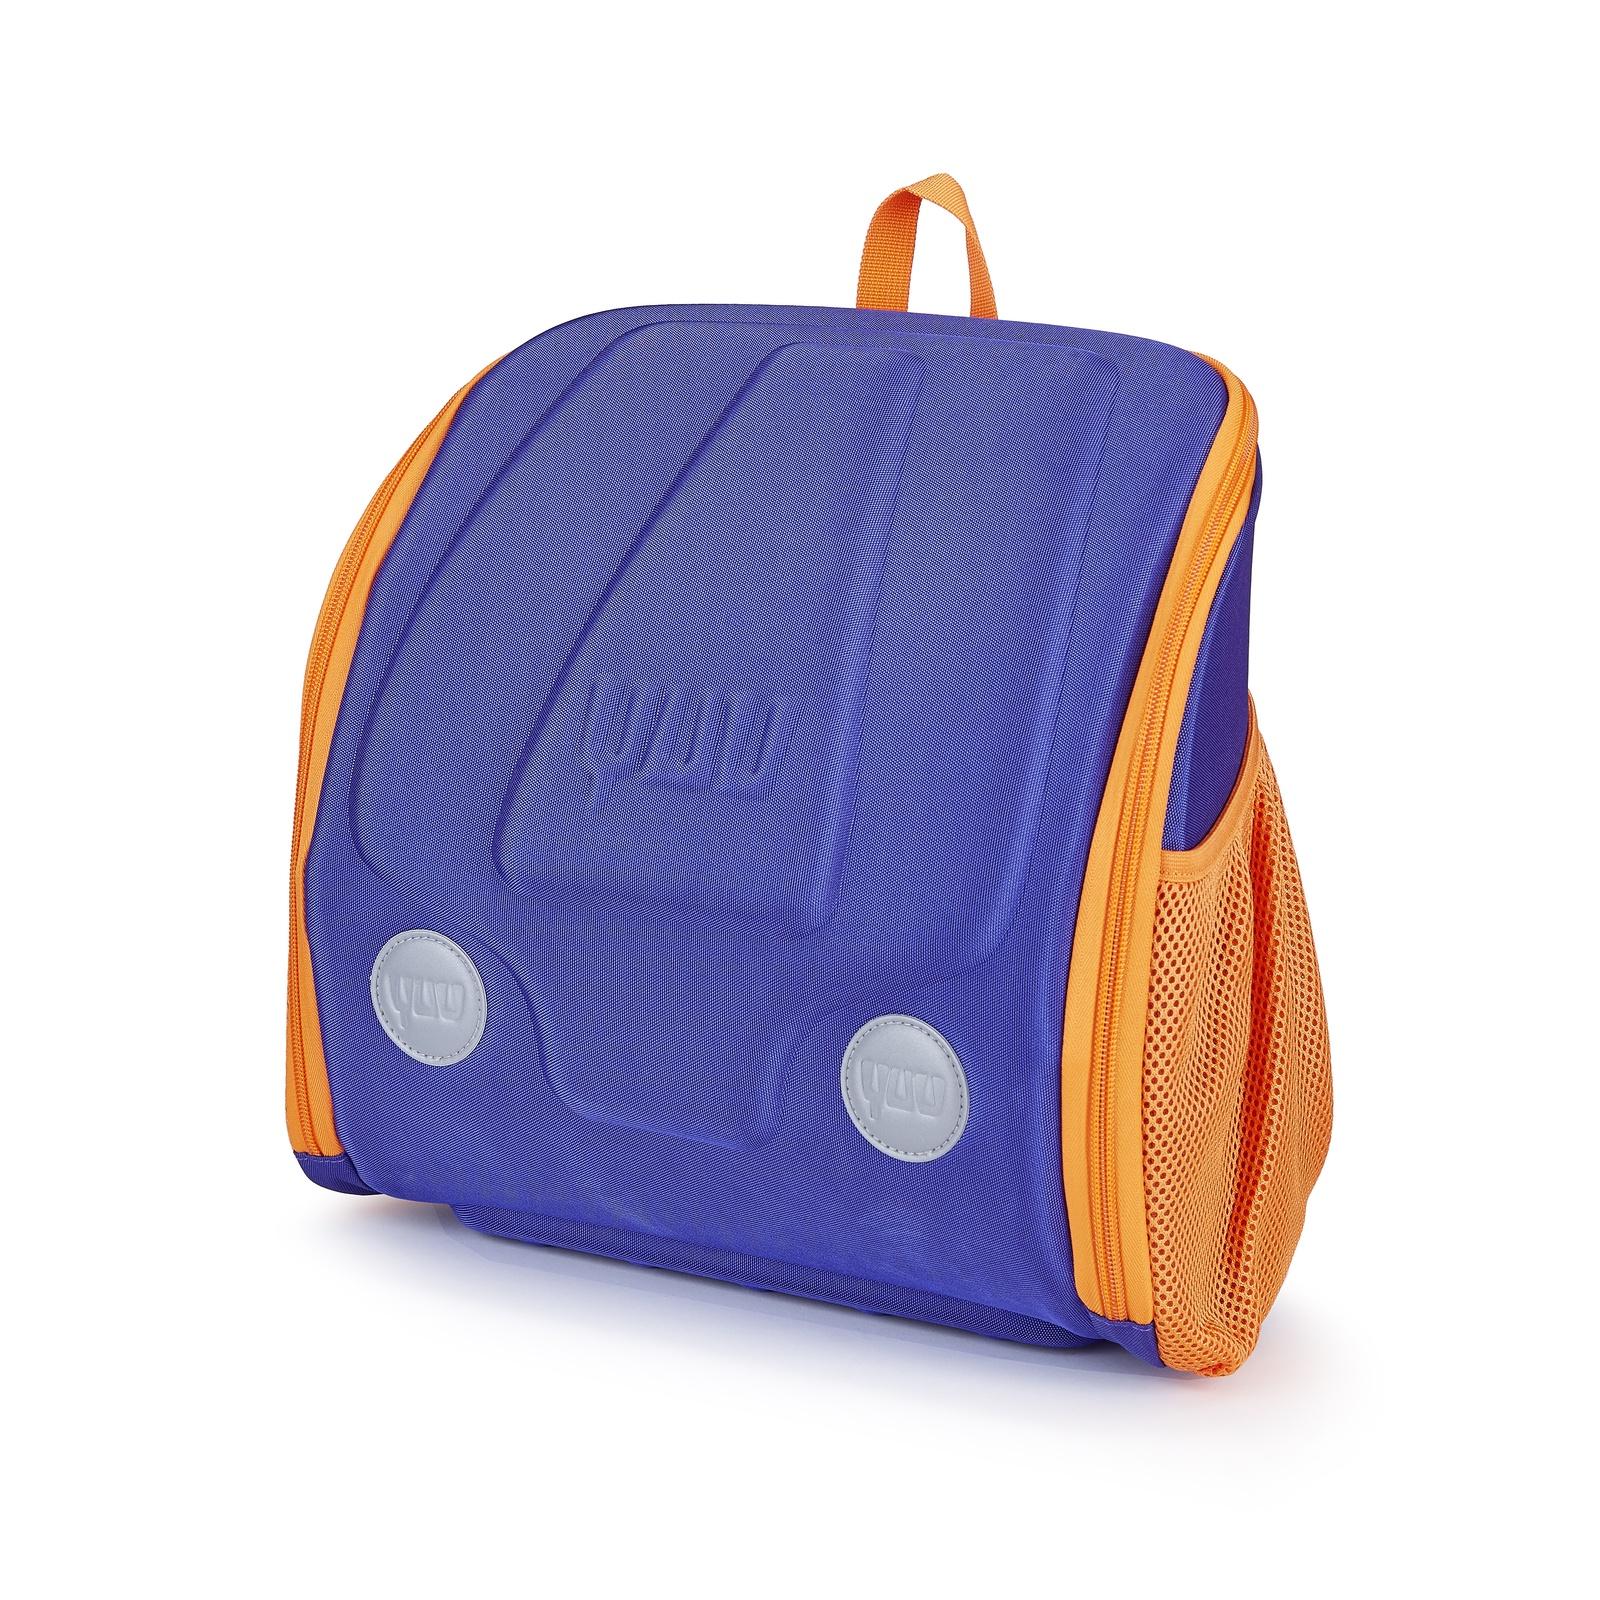 Ранец школьный Yuu Hydroxycut Max Pro Clinical рюкзак yuu muusic special edition